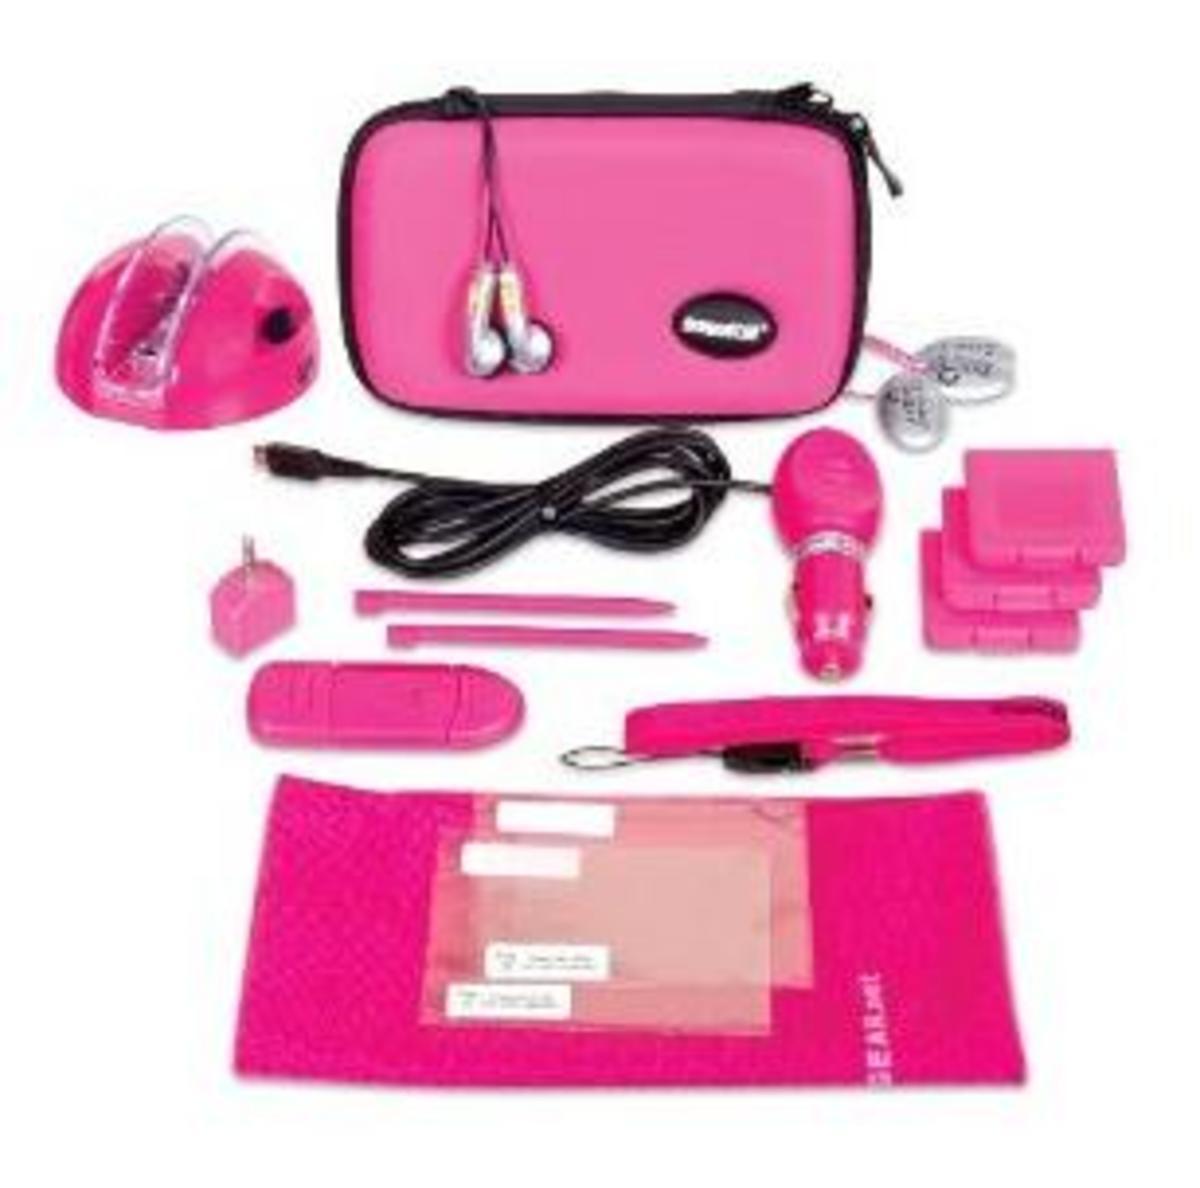 Pink Nintendo DS kit for girls